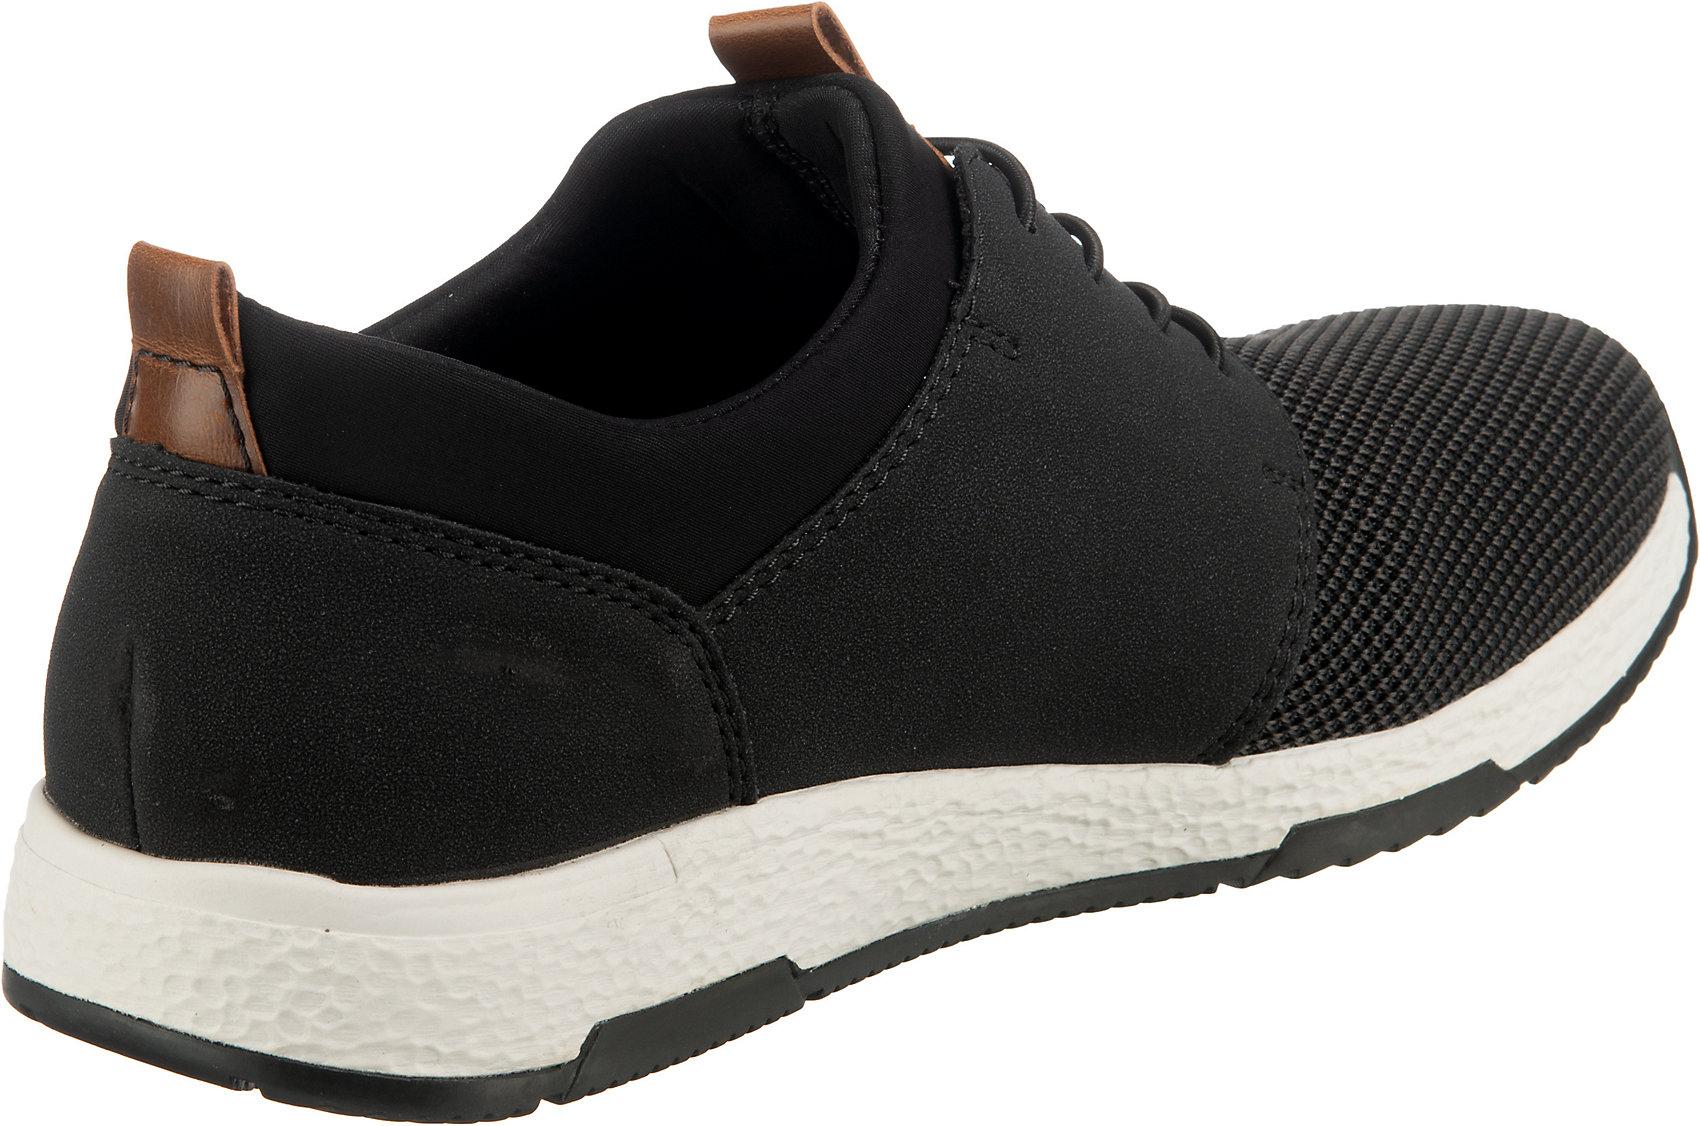 Indexbild 11 - Neu rieker Sneakers Low 12842477 für Herren schwarz